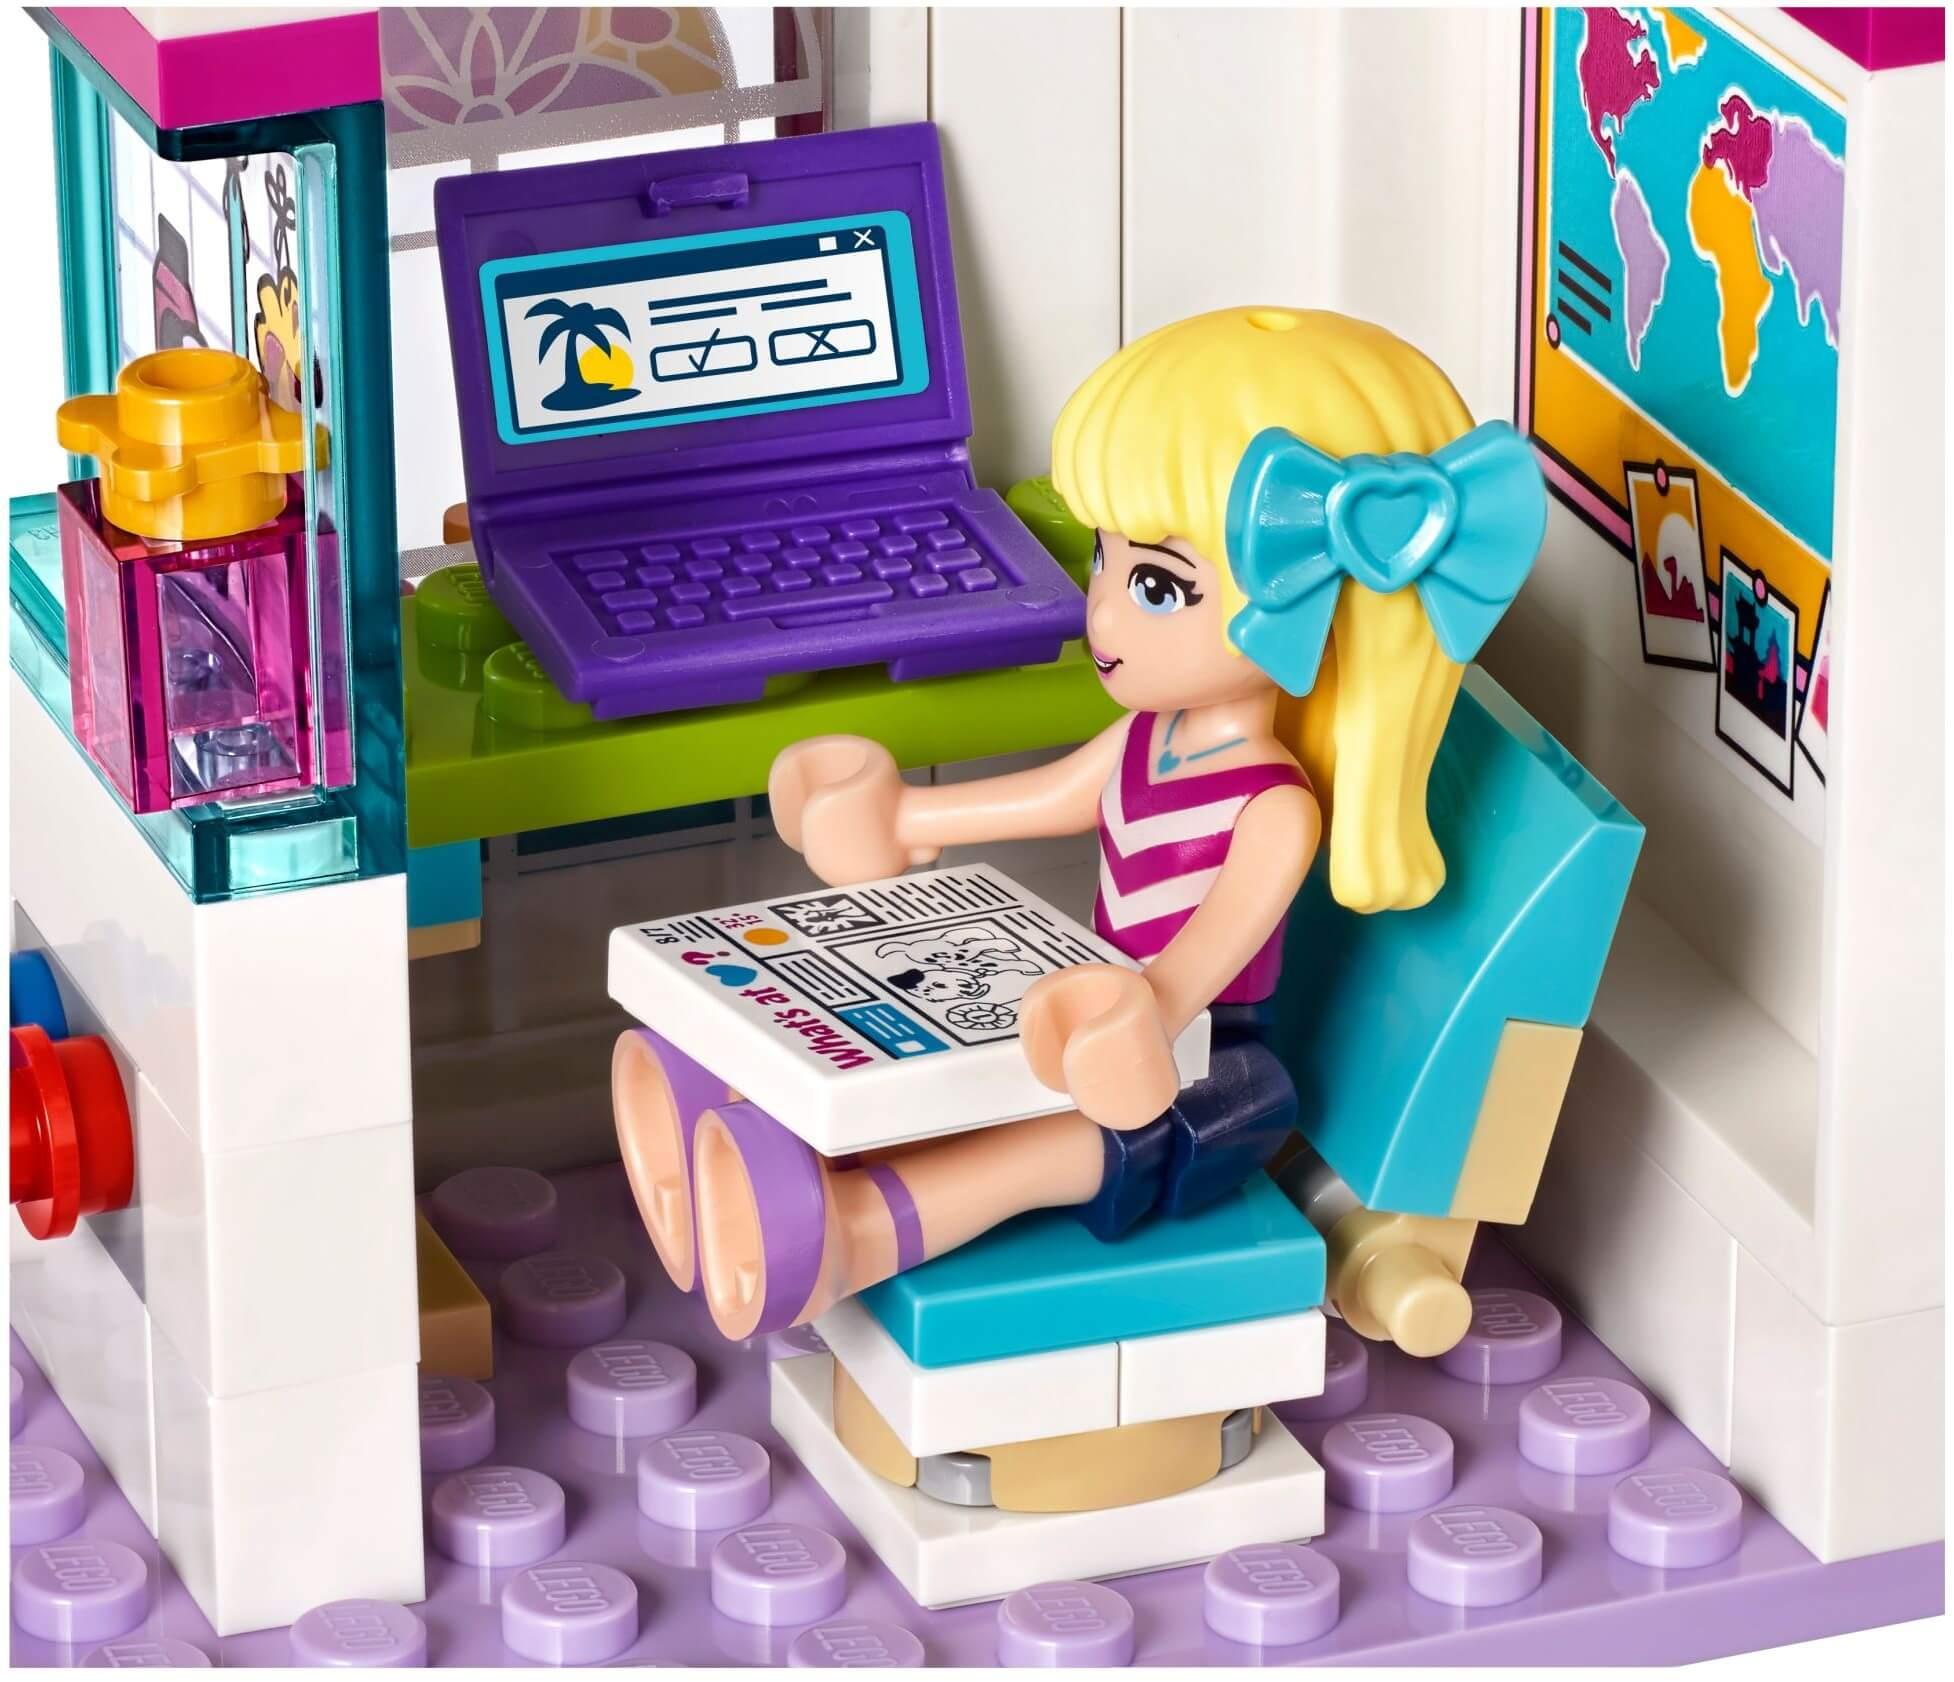 Mua đồ chơi LEGO 41314 - LEGO Friends 41314 - Ngôi Nhà của Stephanie (LEGO 41314 Stephanie's House)